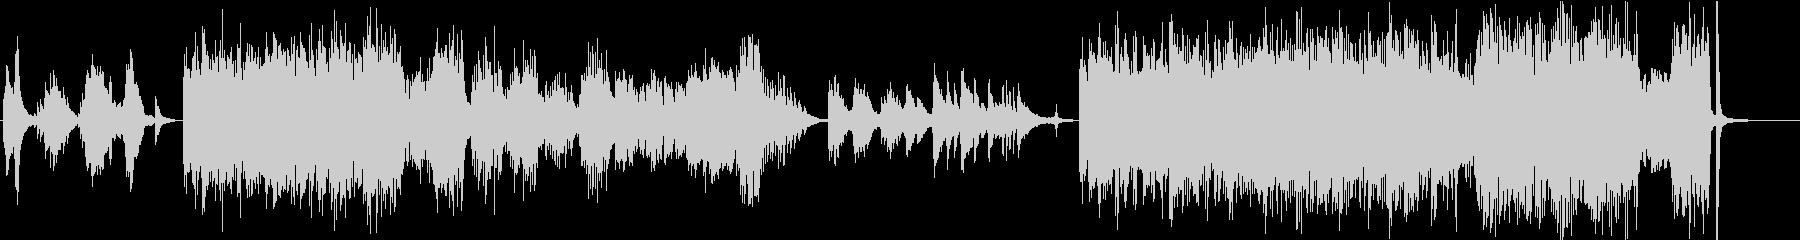 Dramatically dynamic koto ensemble's unreproduced waveform